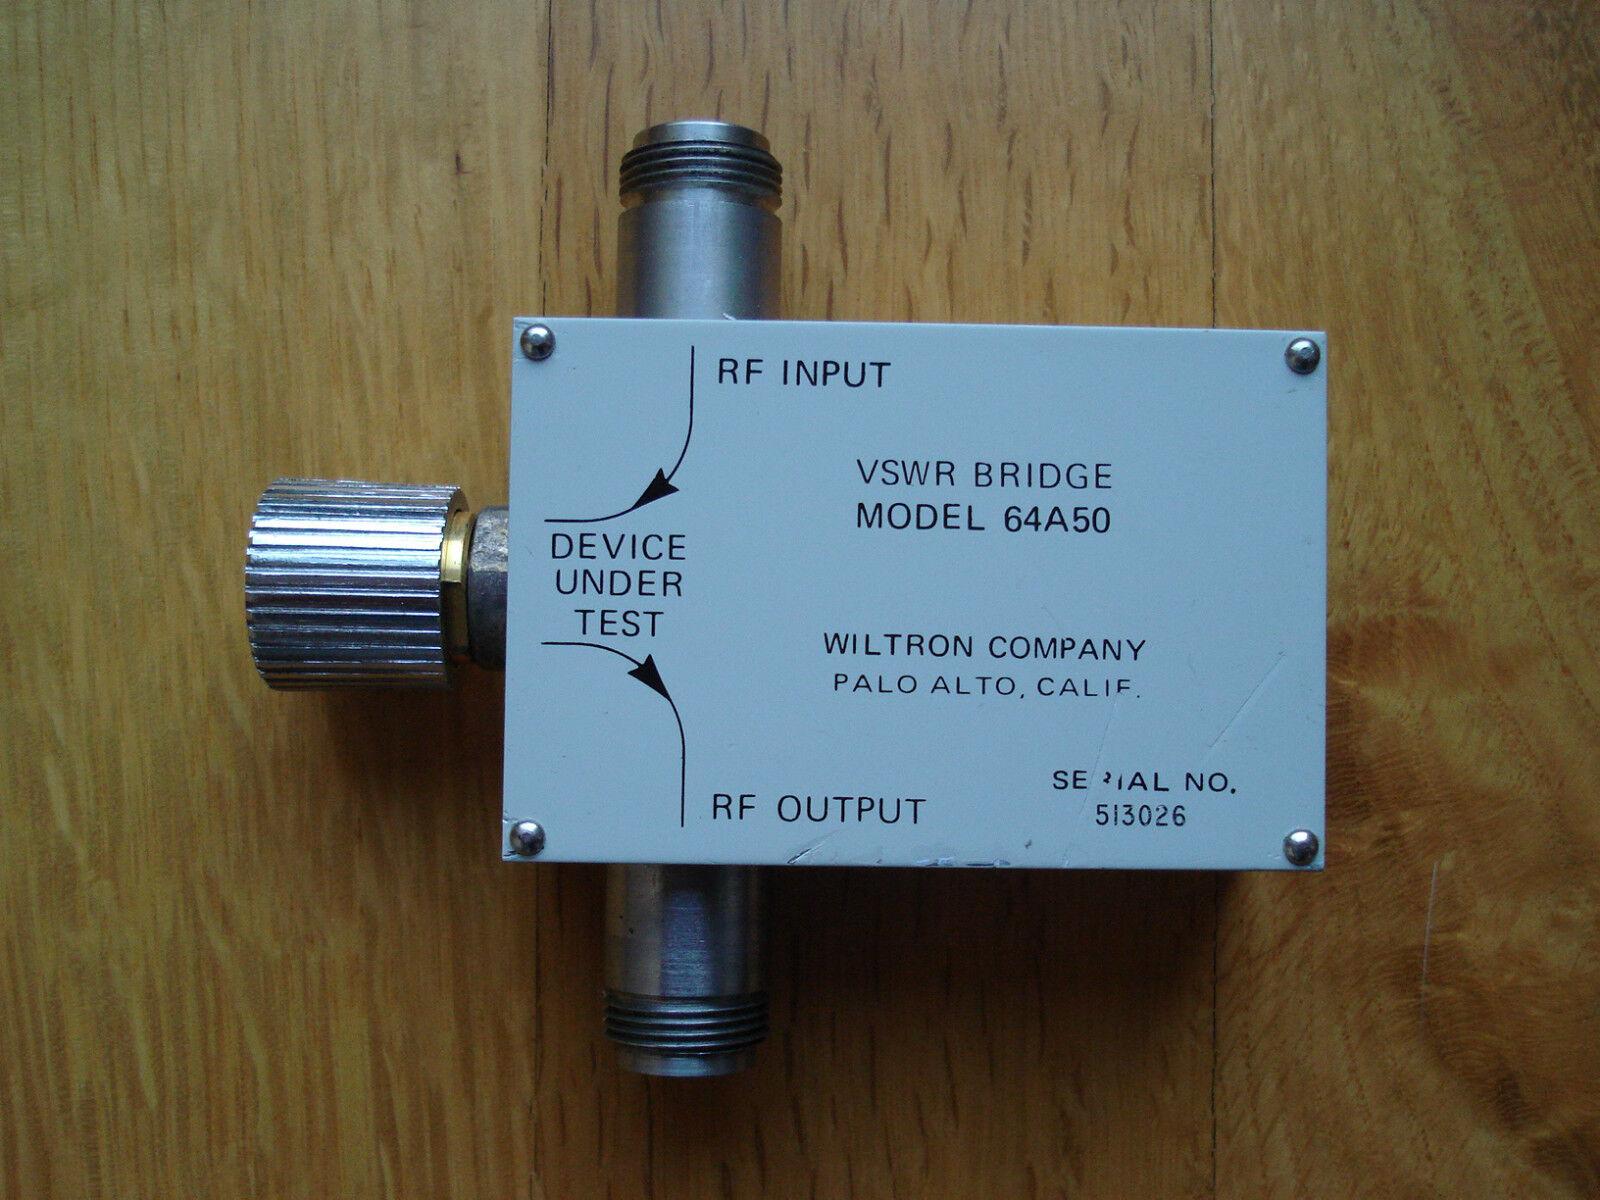 Wiltron VSWR Bridge Mod 64A50, 2-8 GHz, Directivity 42 dB.